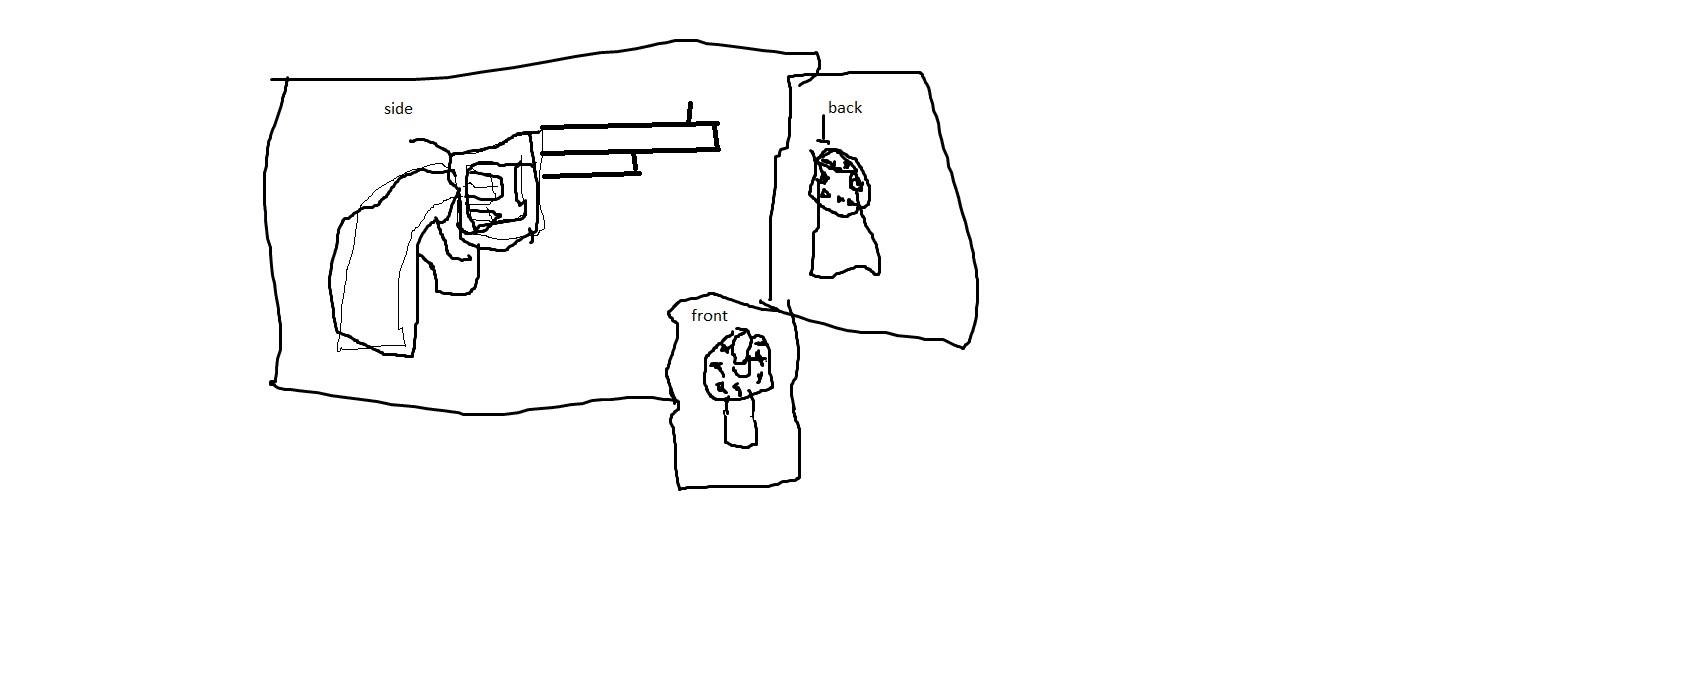 gun draw #1 revolver